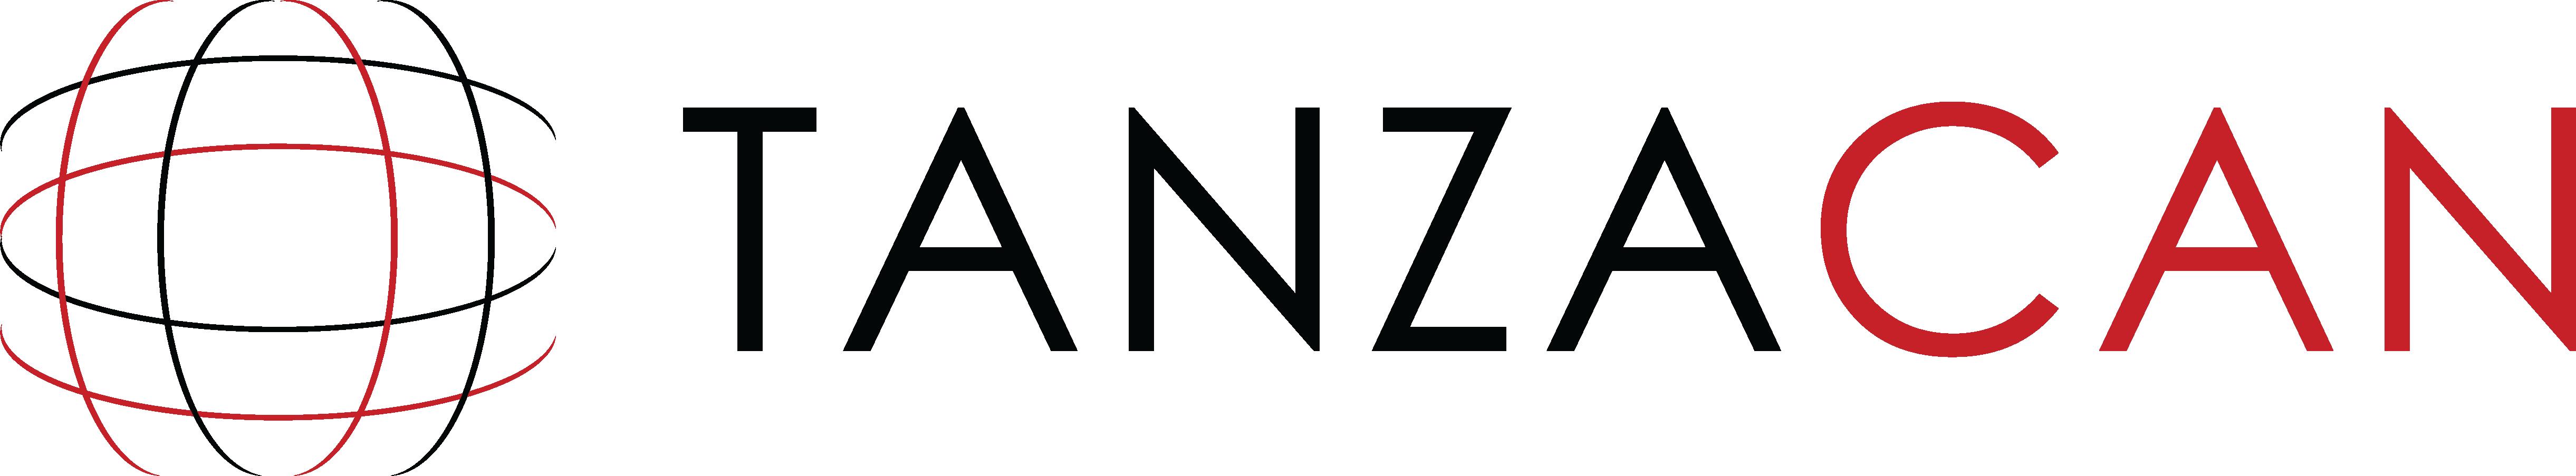 Tanzacan